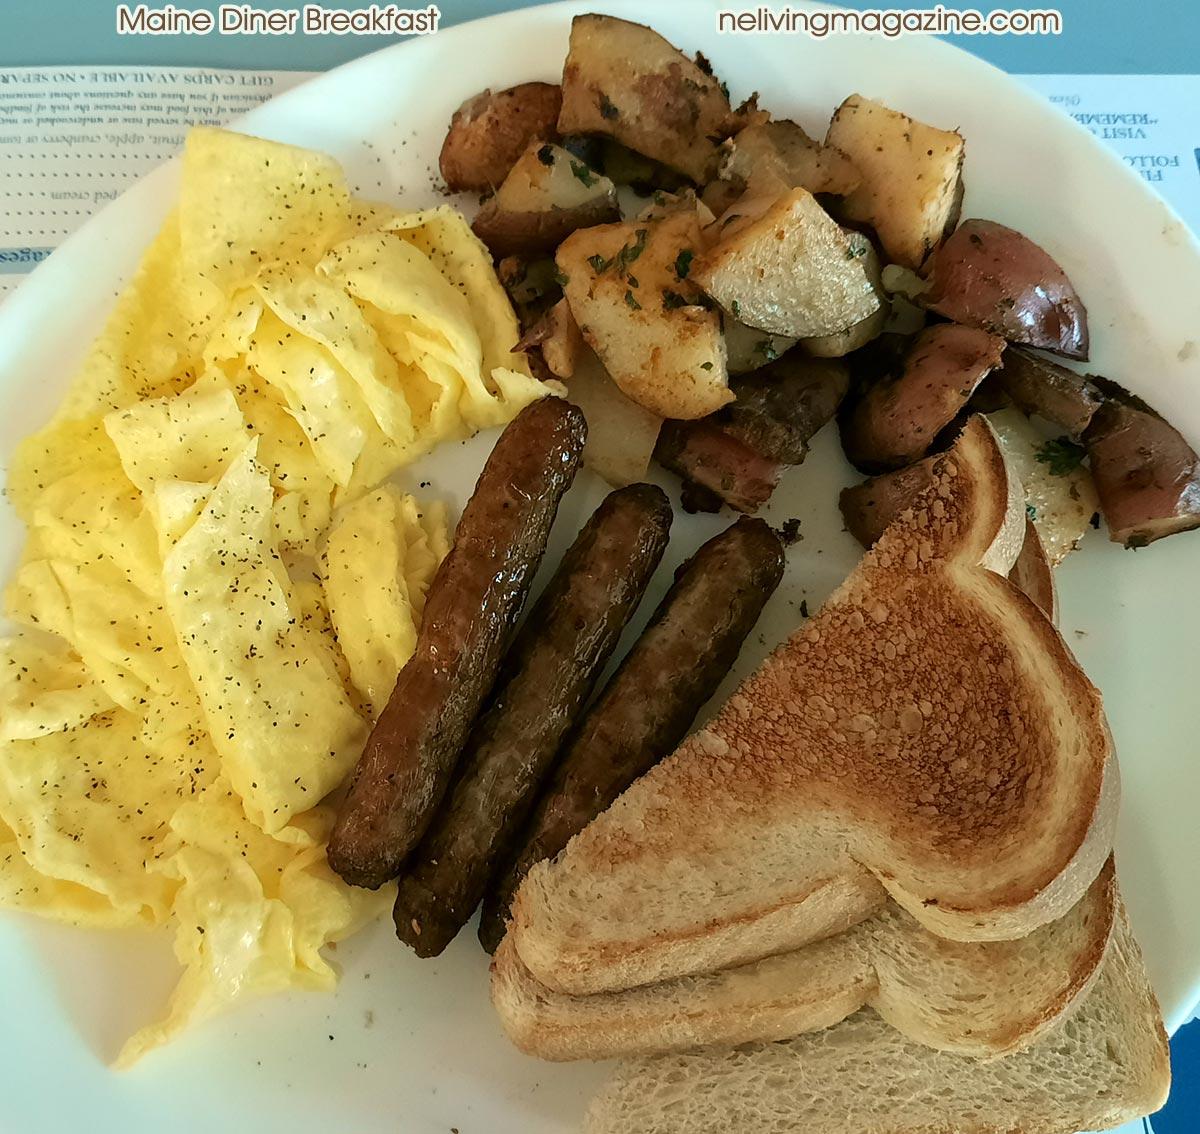 Maine Breakfast at Maine Diner